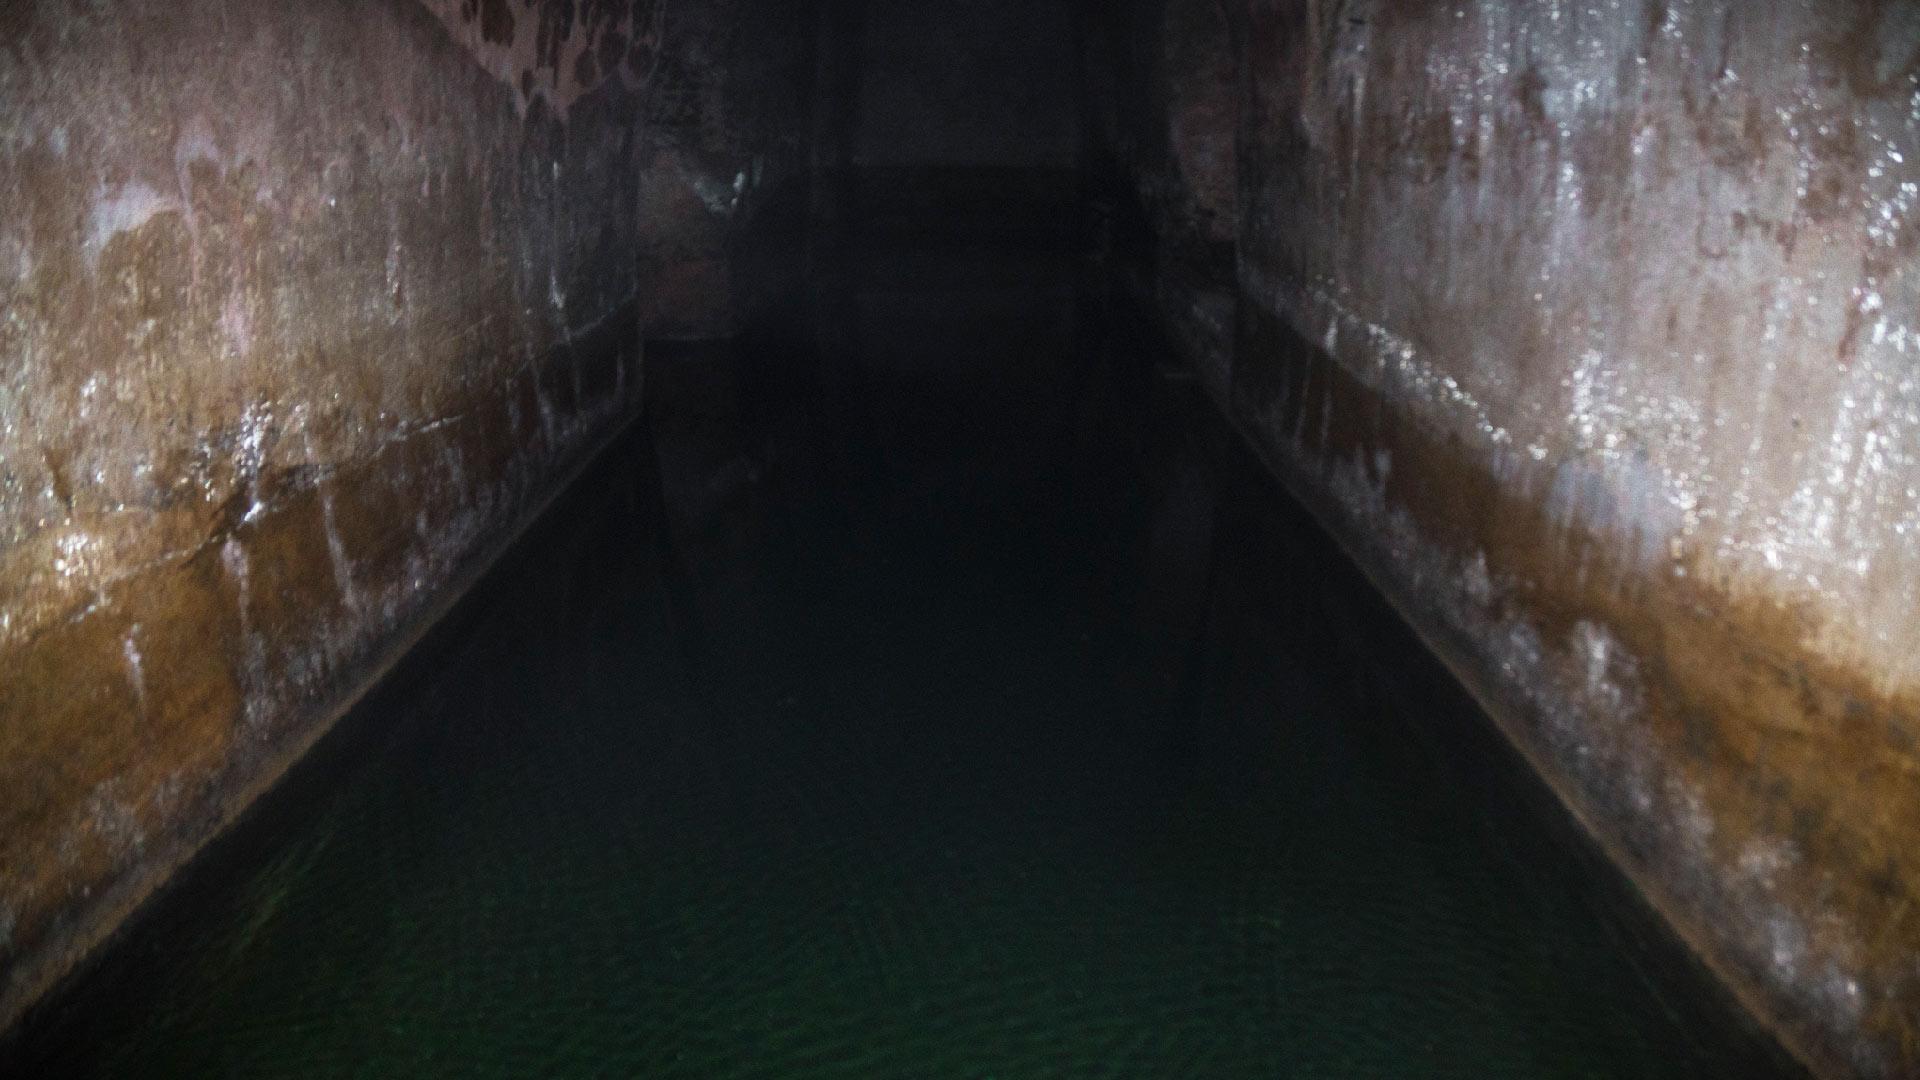 Miseno: la Grotta della Dragonara, mistero dei Campi Flegrei